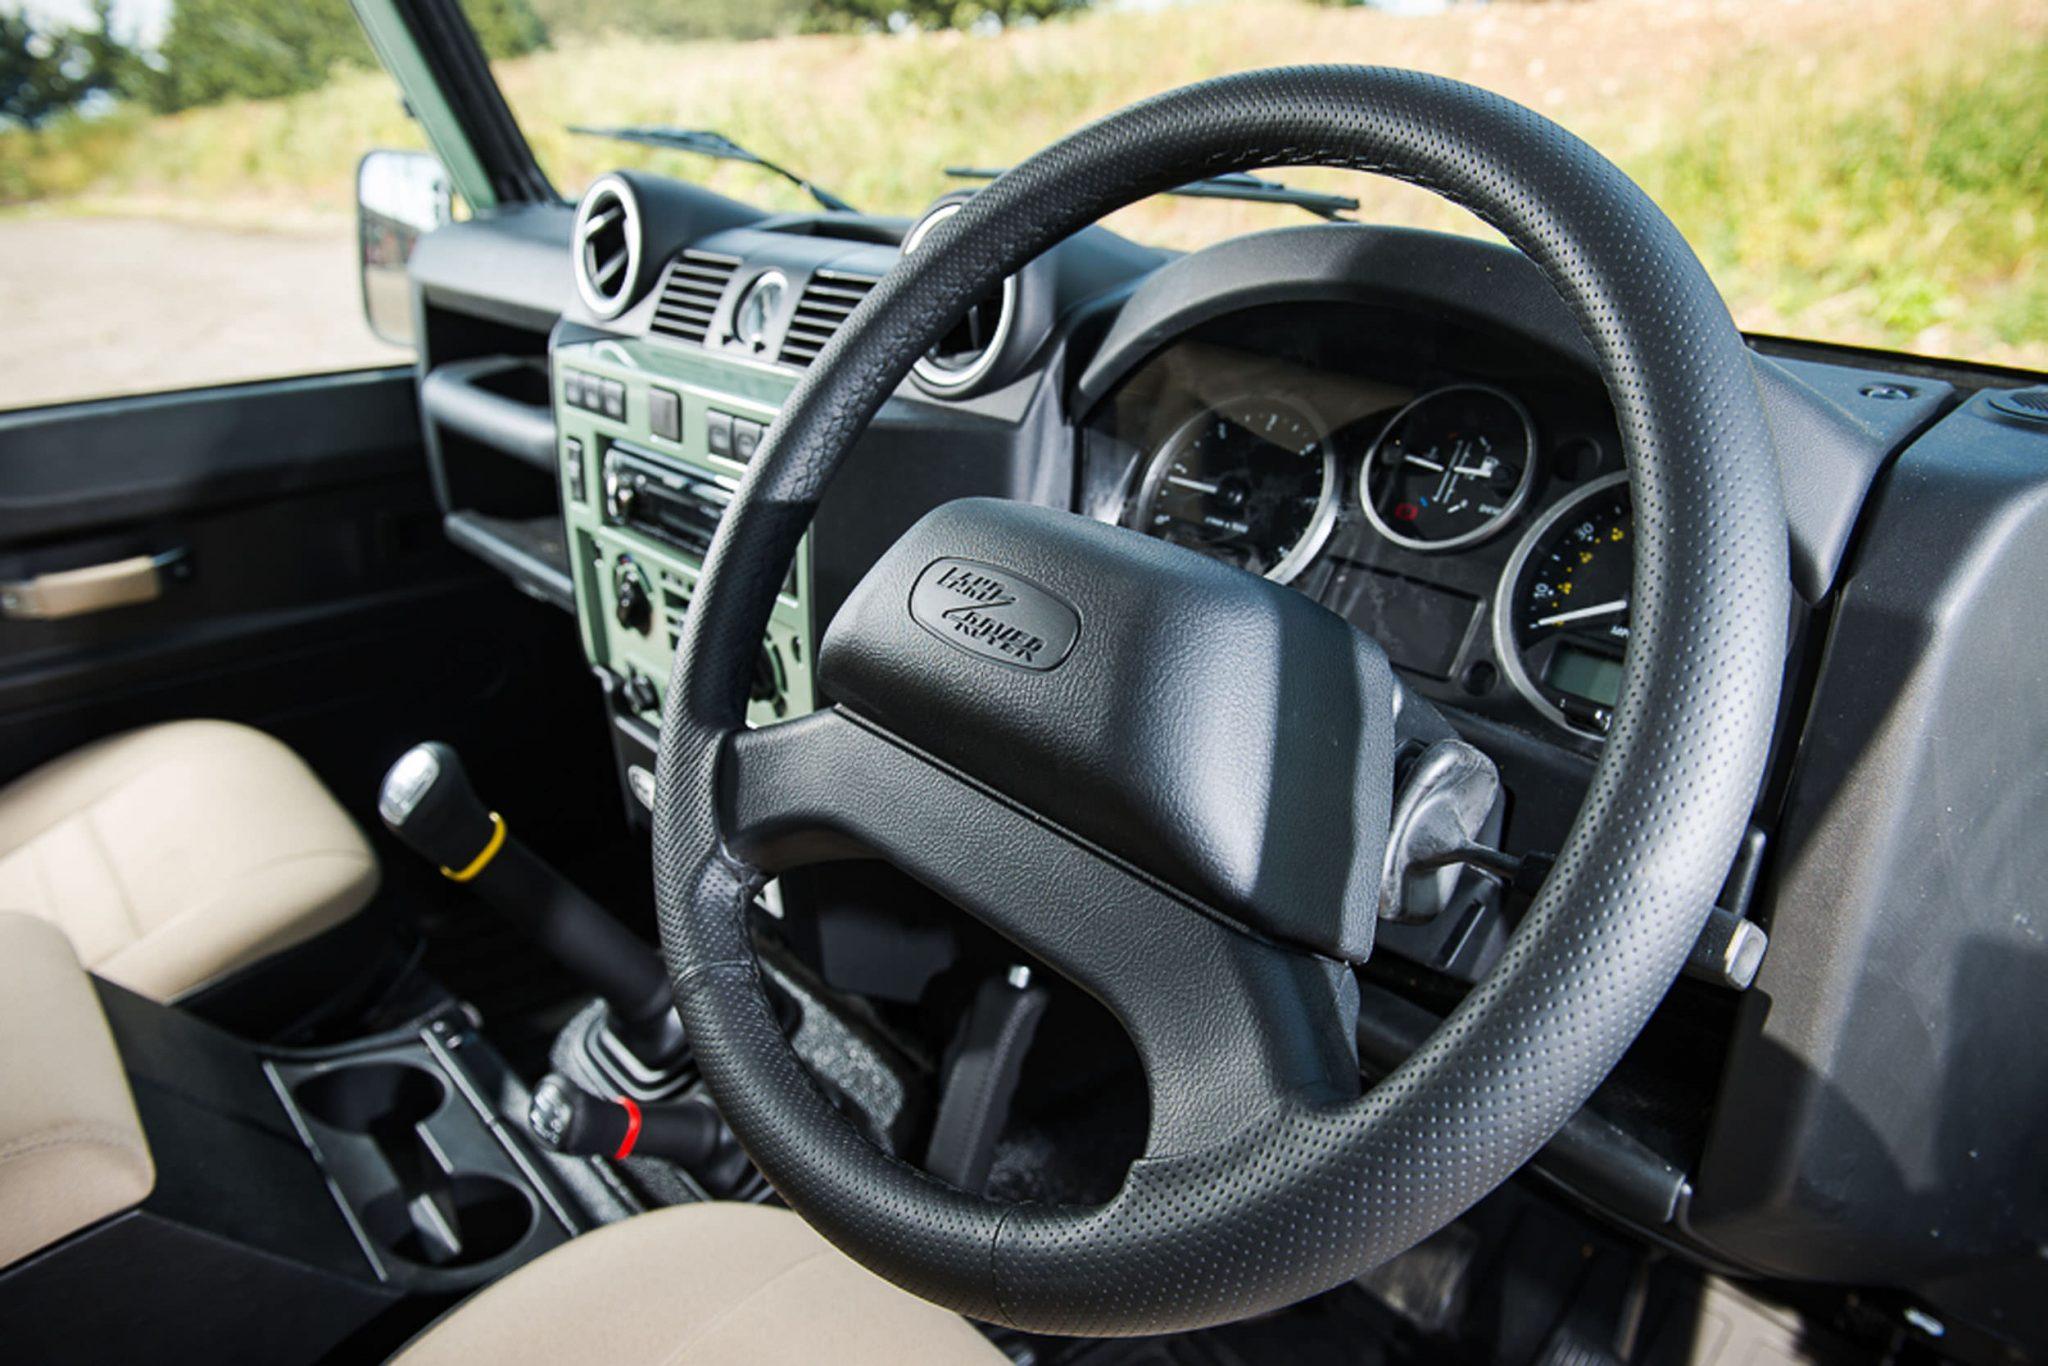 Rowan Atkinson's Land Rover Defender 7 - Rowan Atkinson's Land Rover Defender